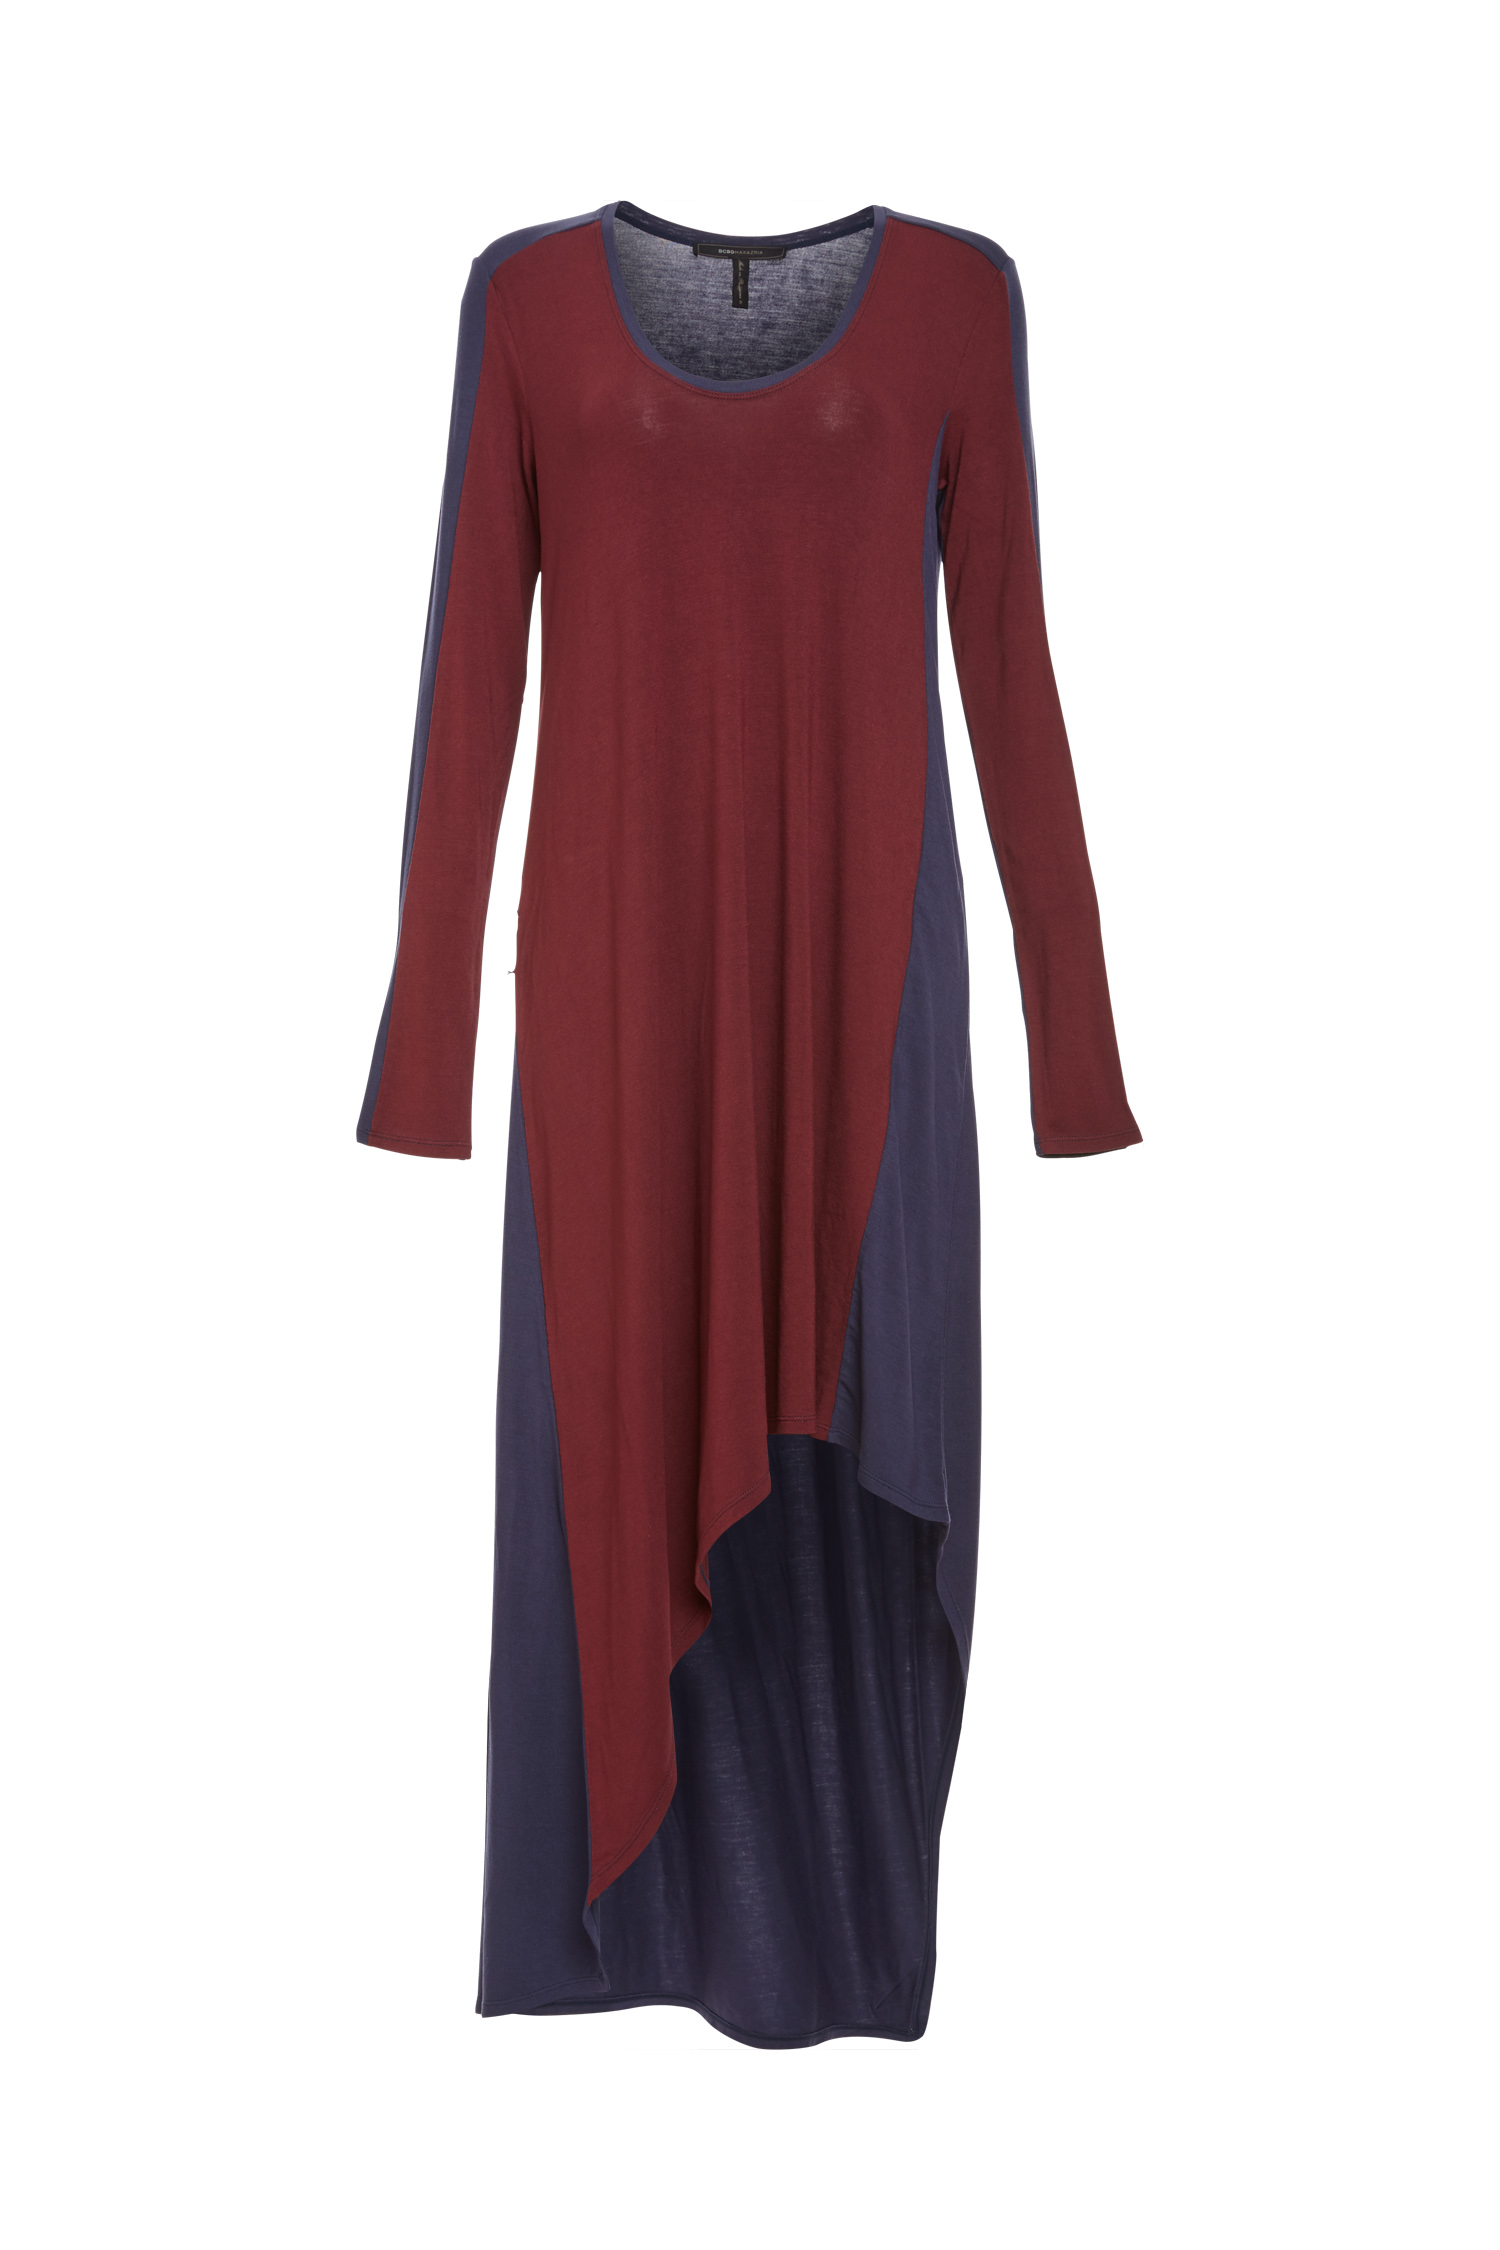 98c6f0292d Dresses | DAILYLOOK